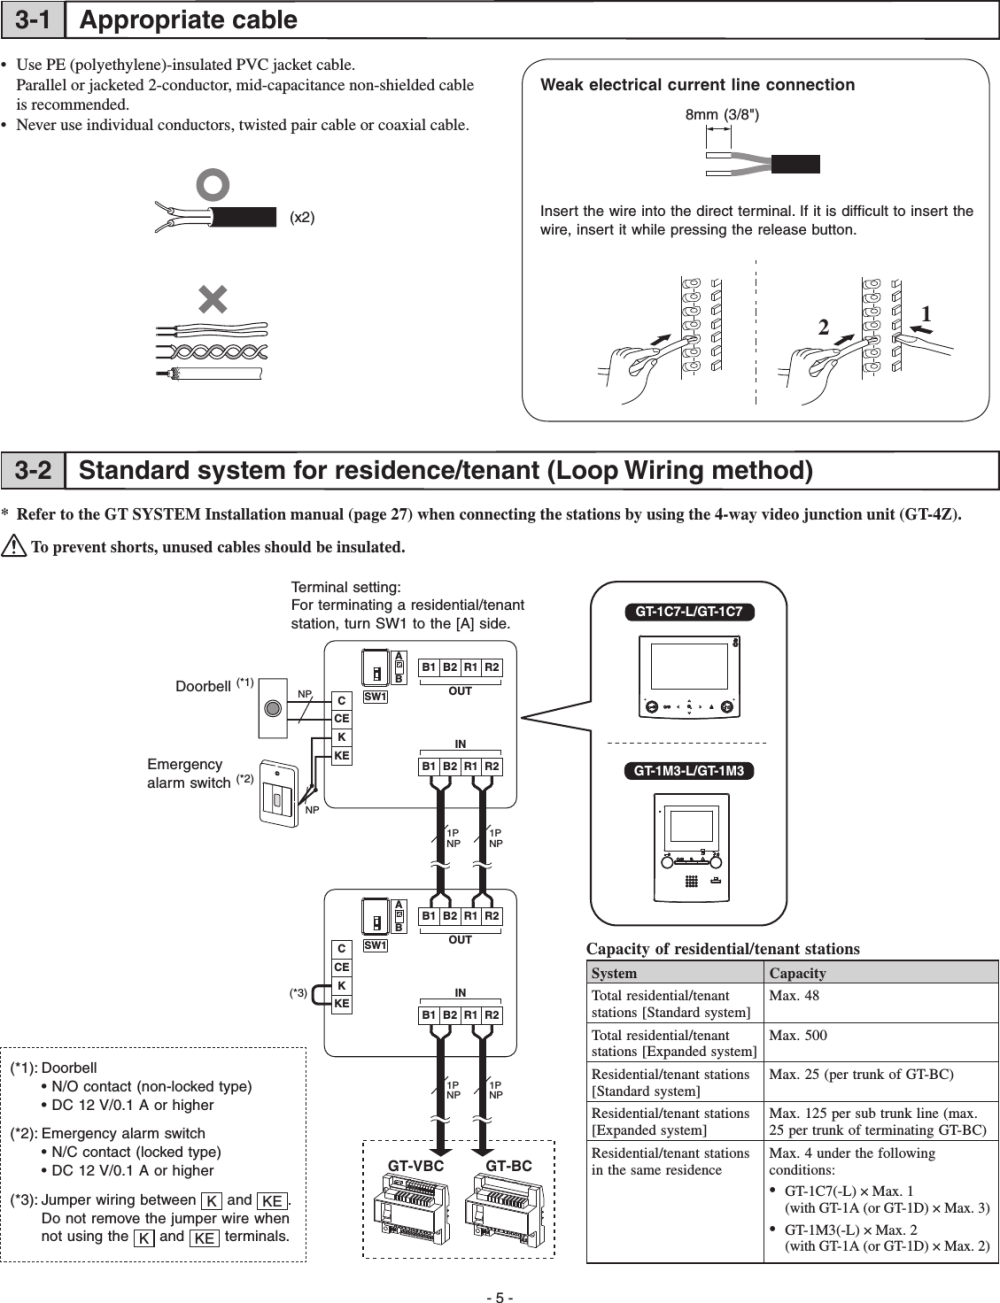 medium resolution of  aiphone gt 1c7 wiring diagram wiring liry diagram h7 on audiovox wiring diagrams